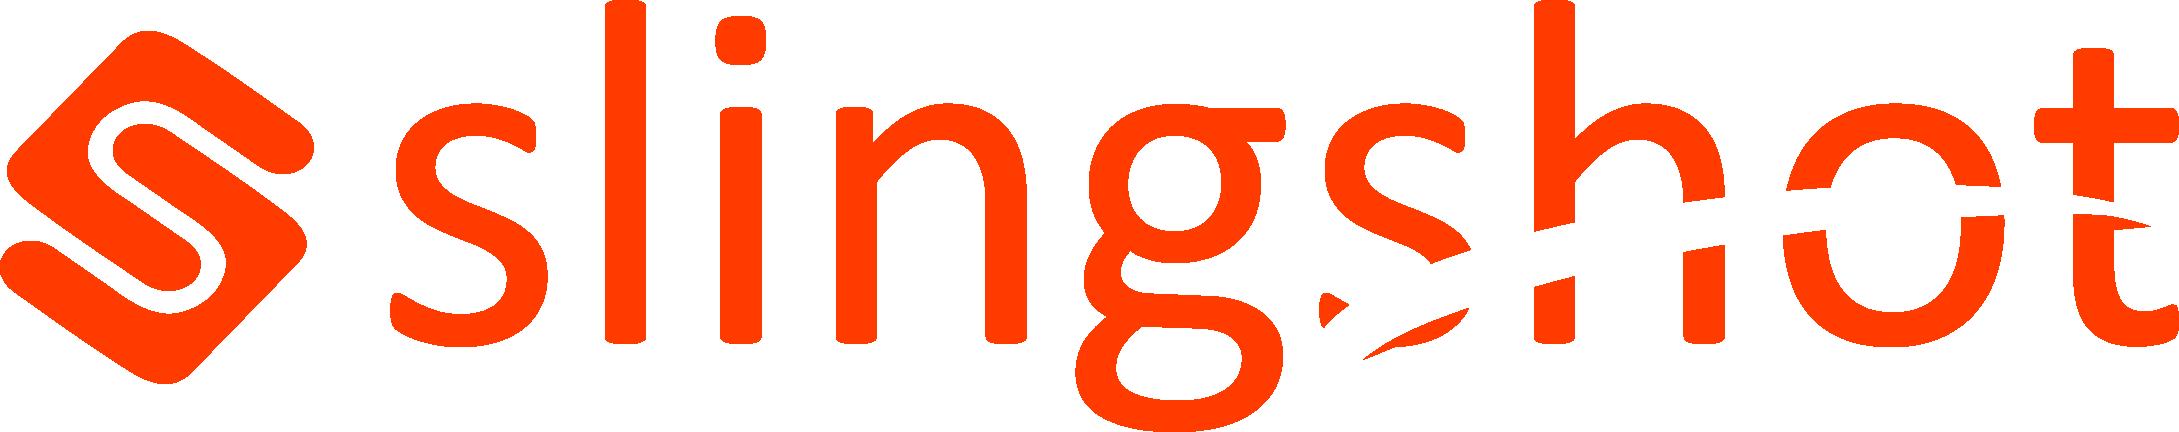 Slingshot Jobs Inbound Sales Representative Apply online – Inbound Sales Jobs